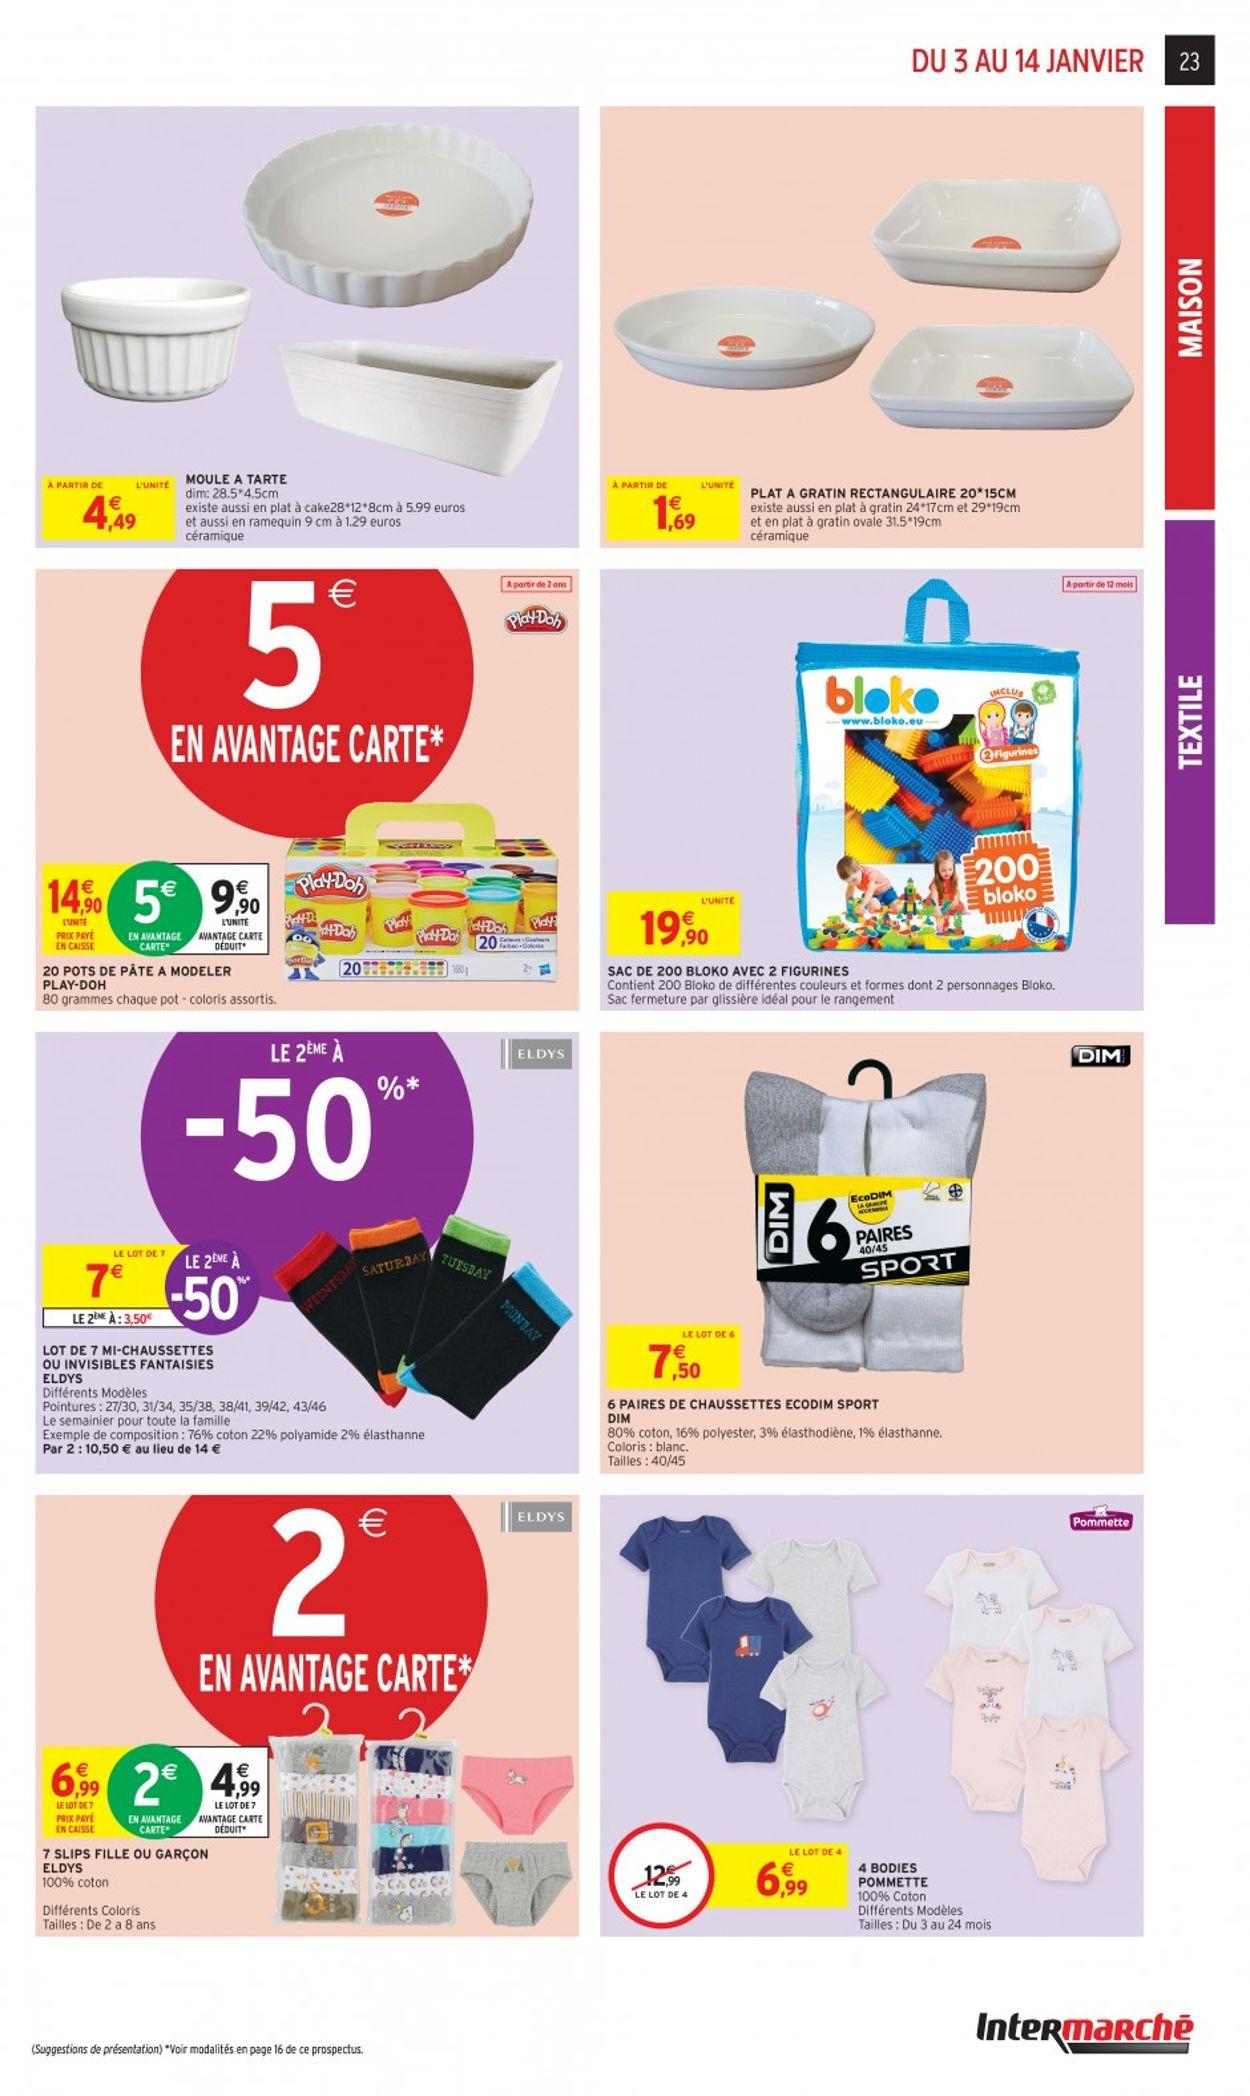 Intermarché Catalogue - 03.01-14.01.2020 (Page 23)